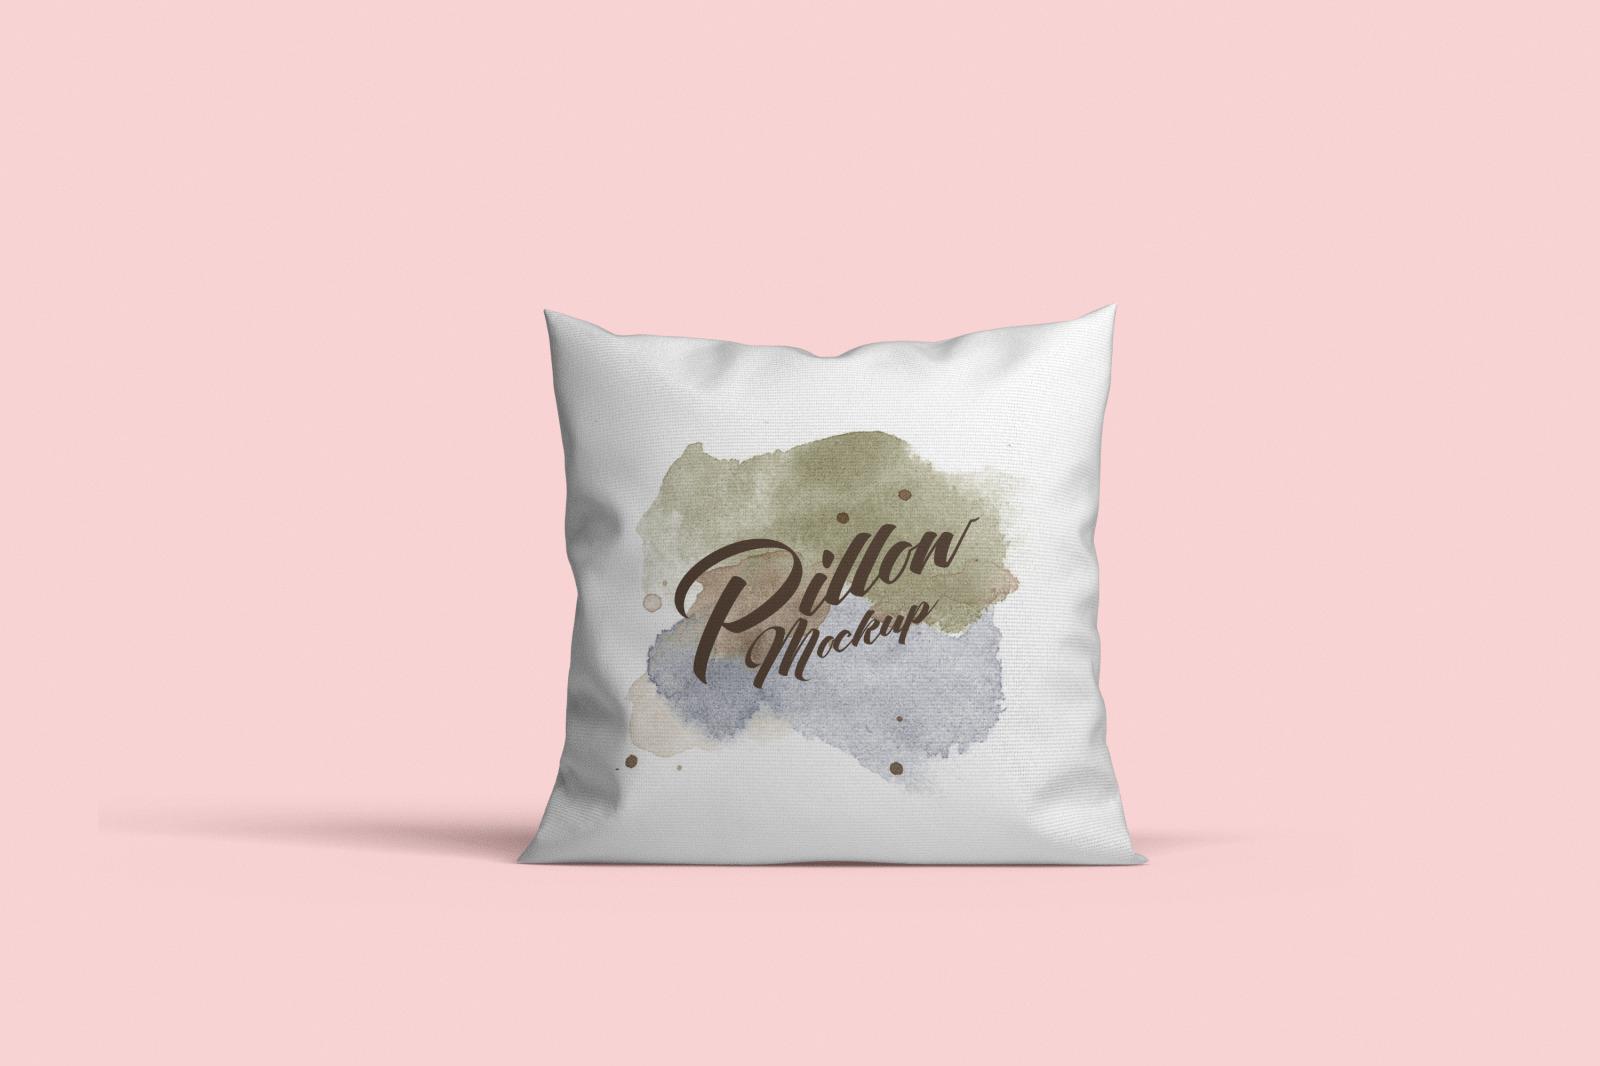 Square pillow mockups